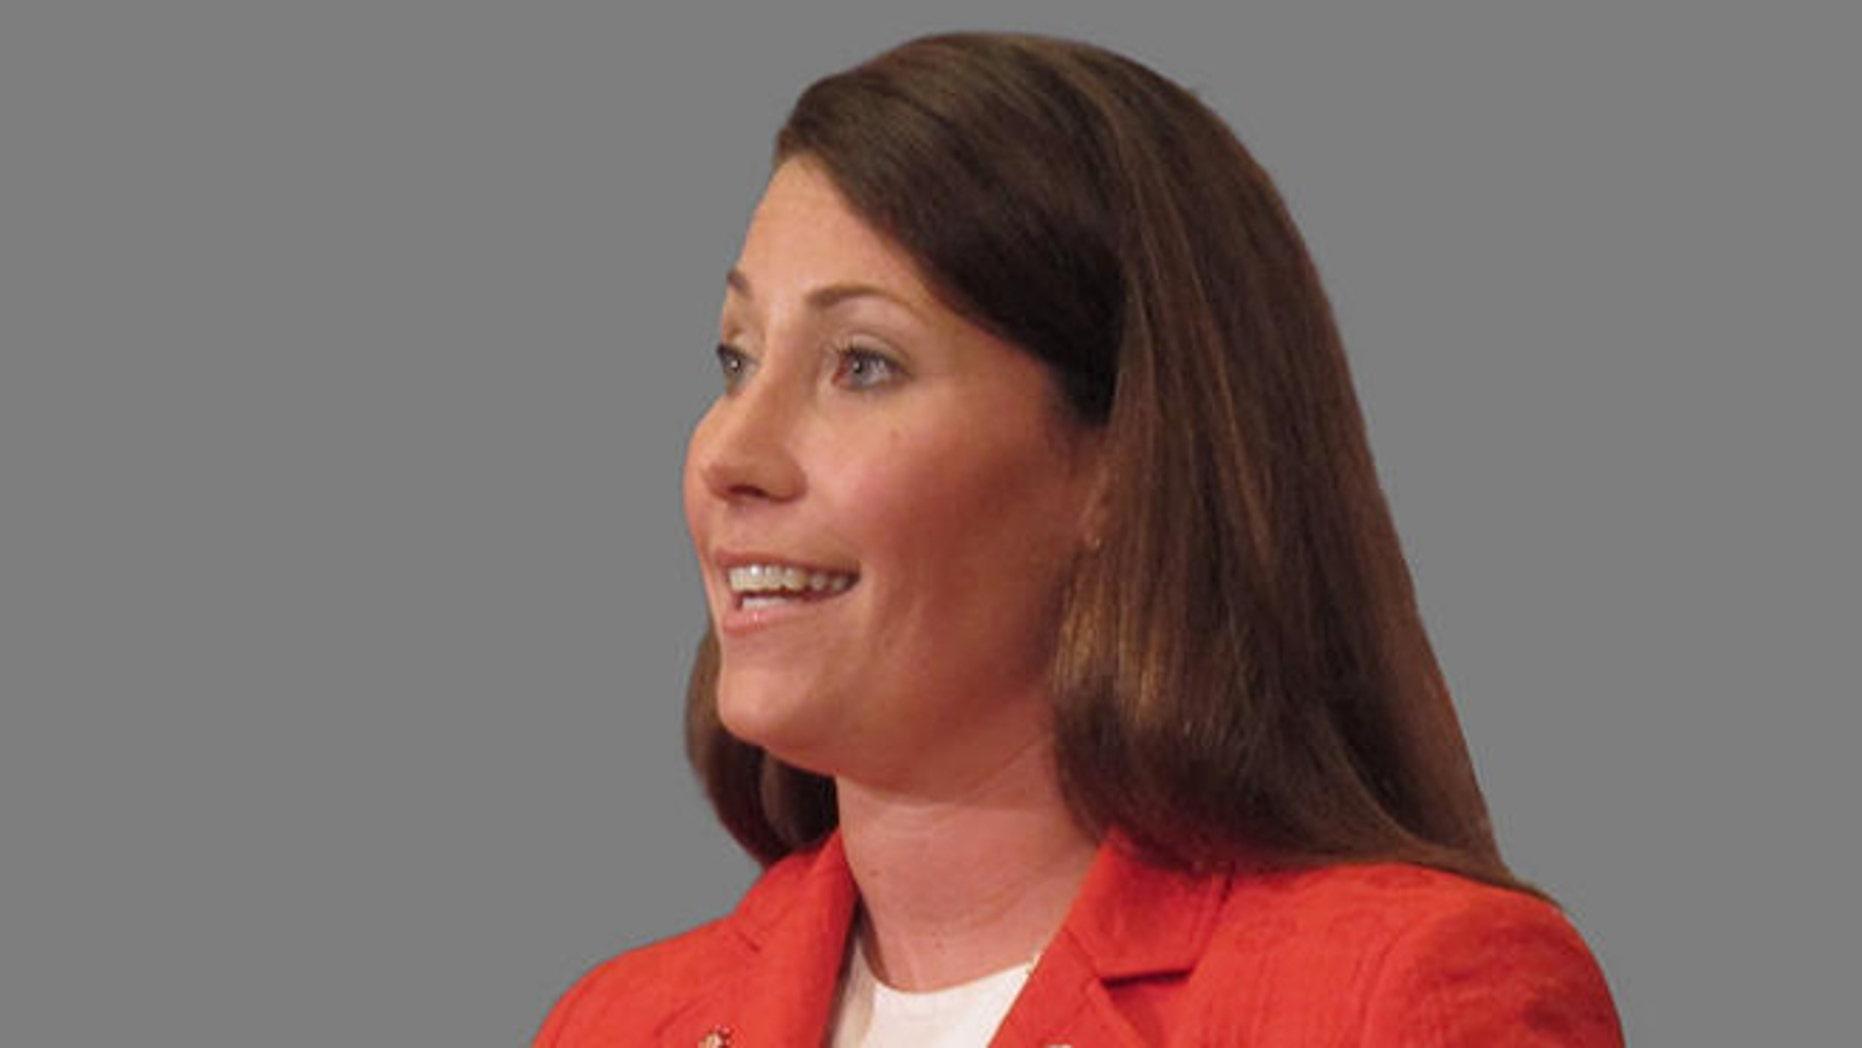 FILE: July 7, 2013: Alison Lundergan Grimes, a Democratic candidate for U.S. Senate, in Kentucky. (headshot.)